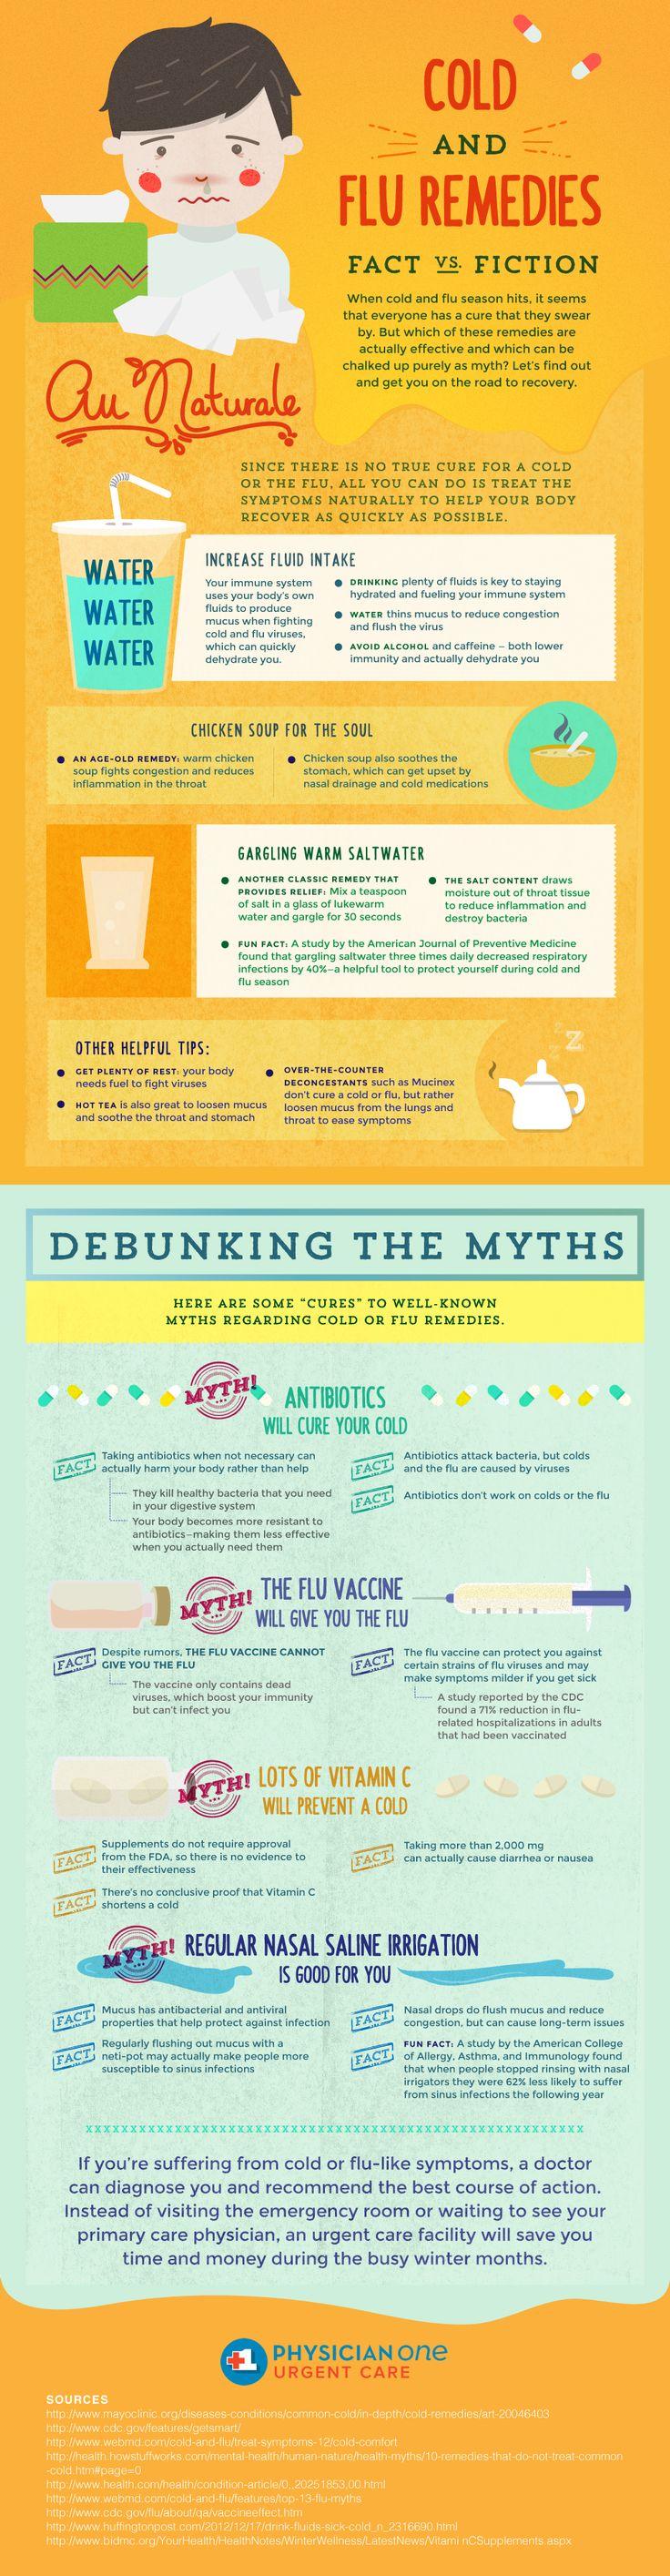 Cold & Flu Remedies: Fact vs. Fiction